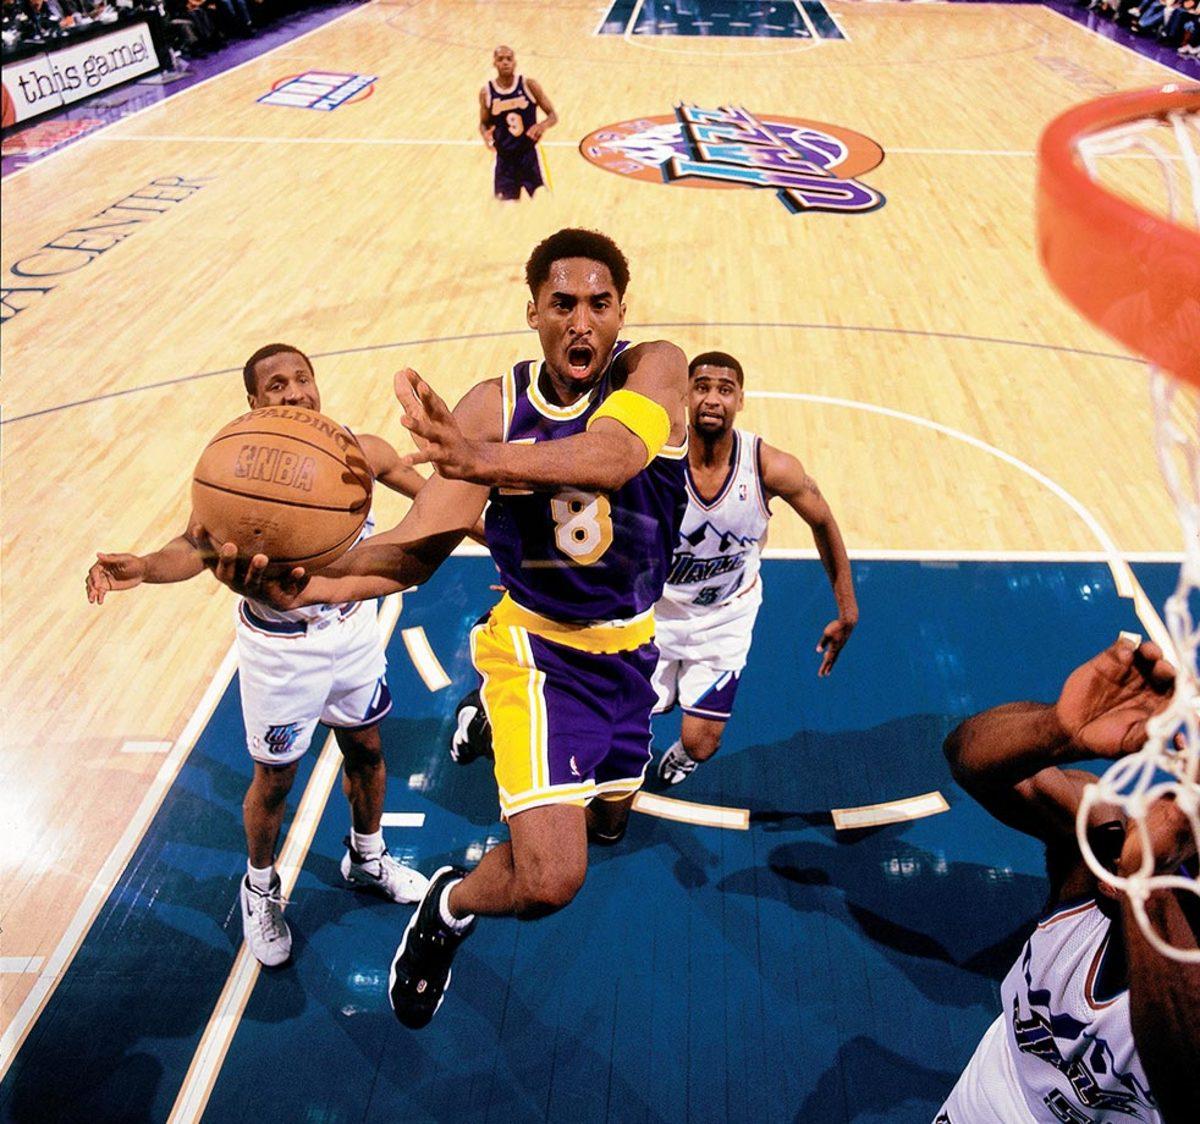 1998-0518-Kobe-Bryant-NBA01S.jpg